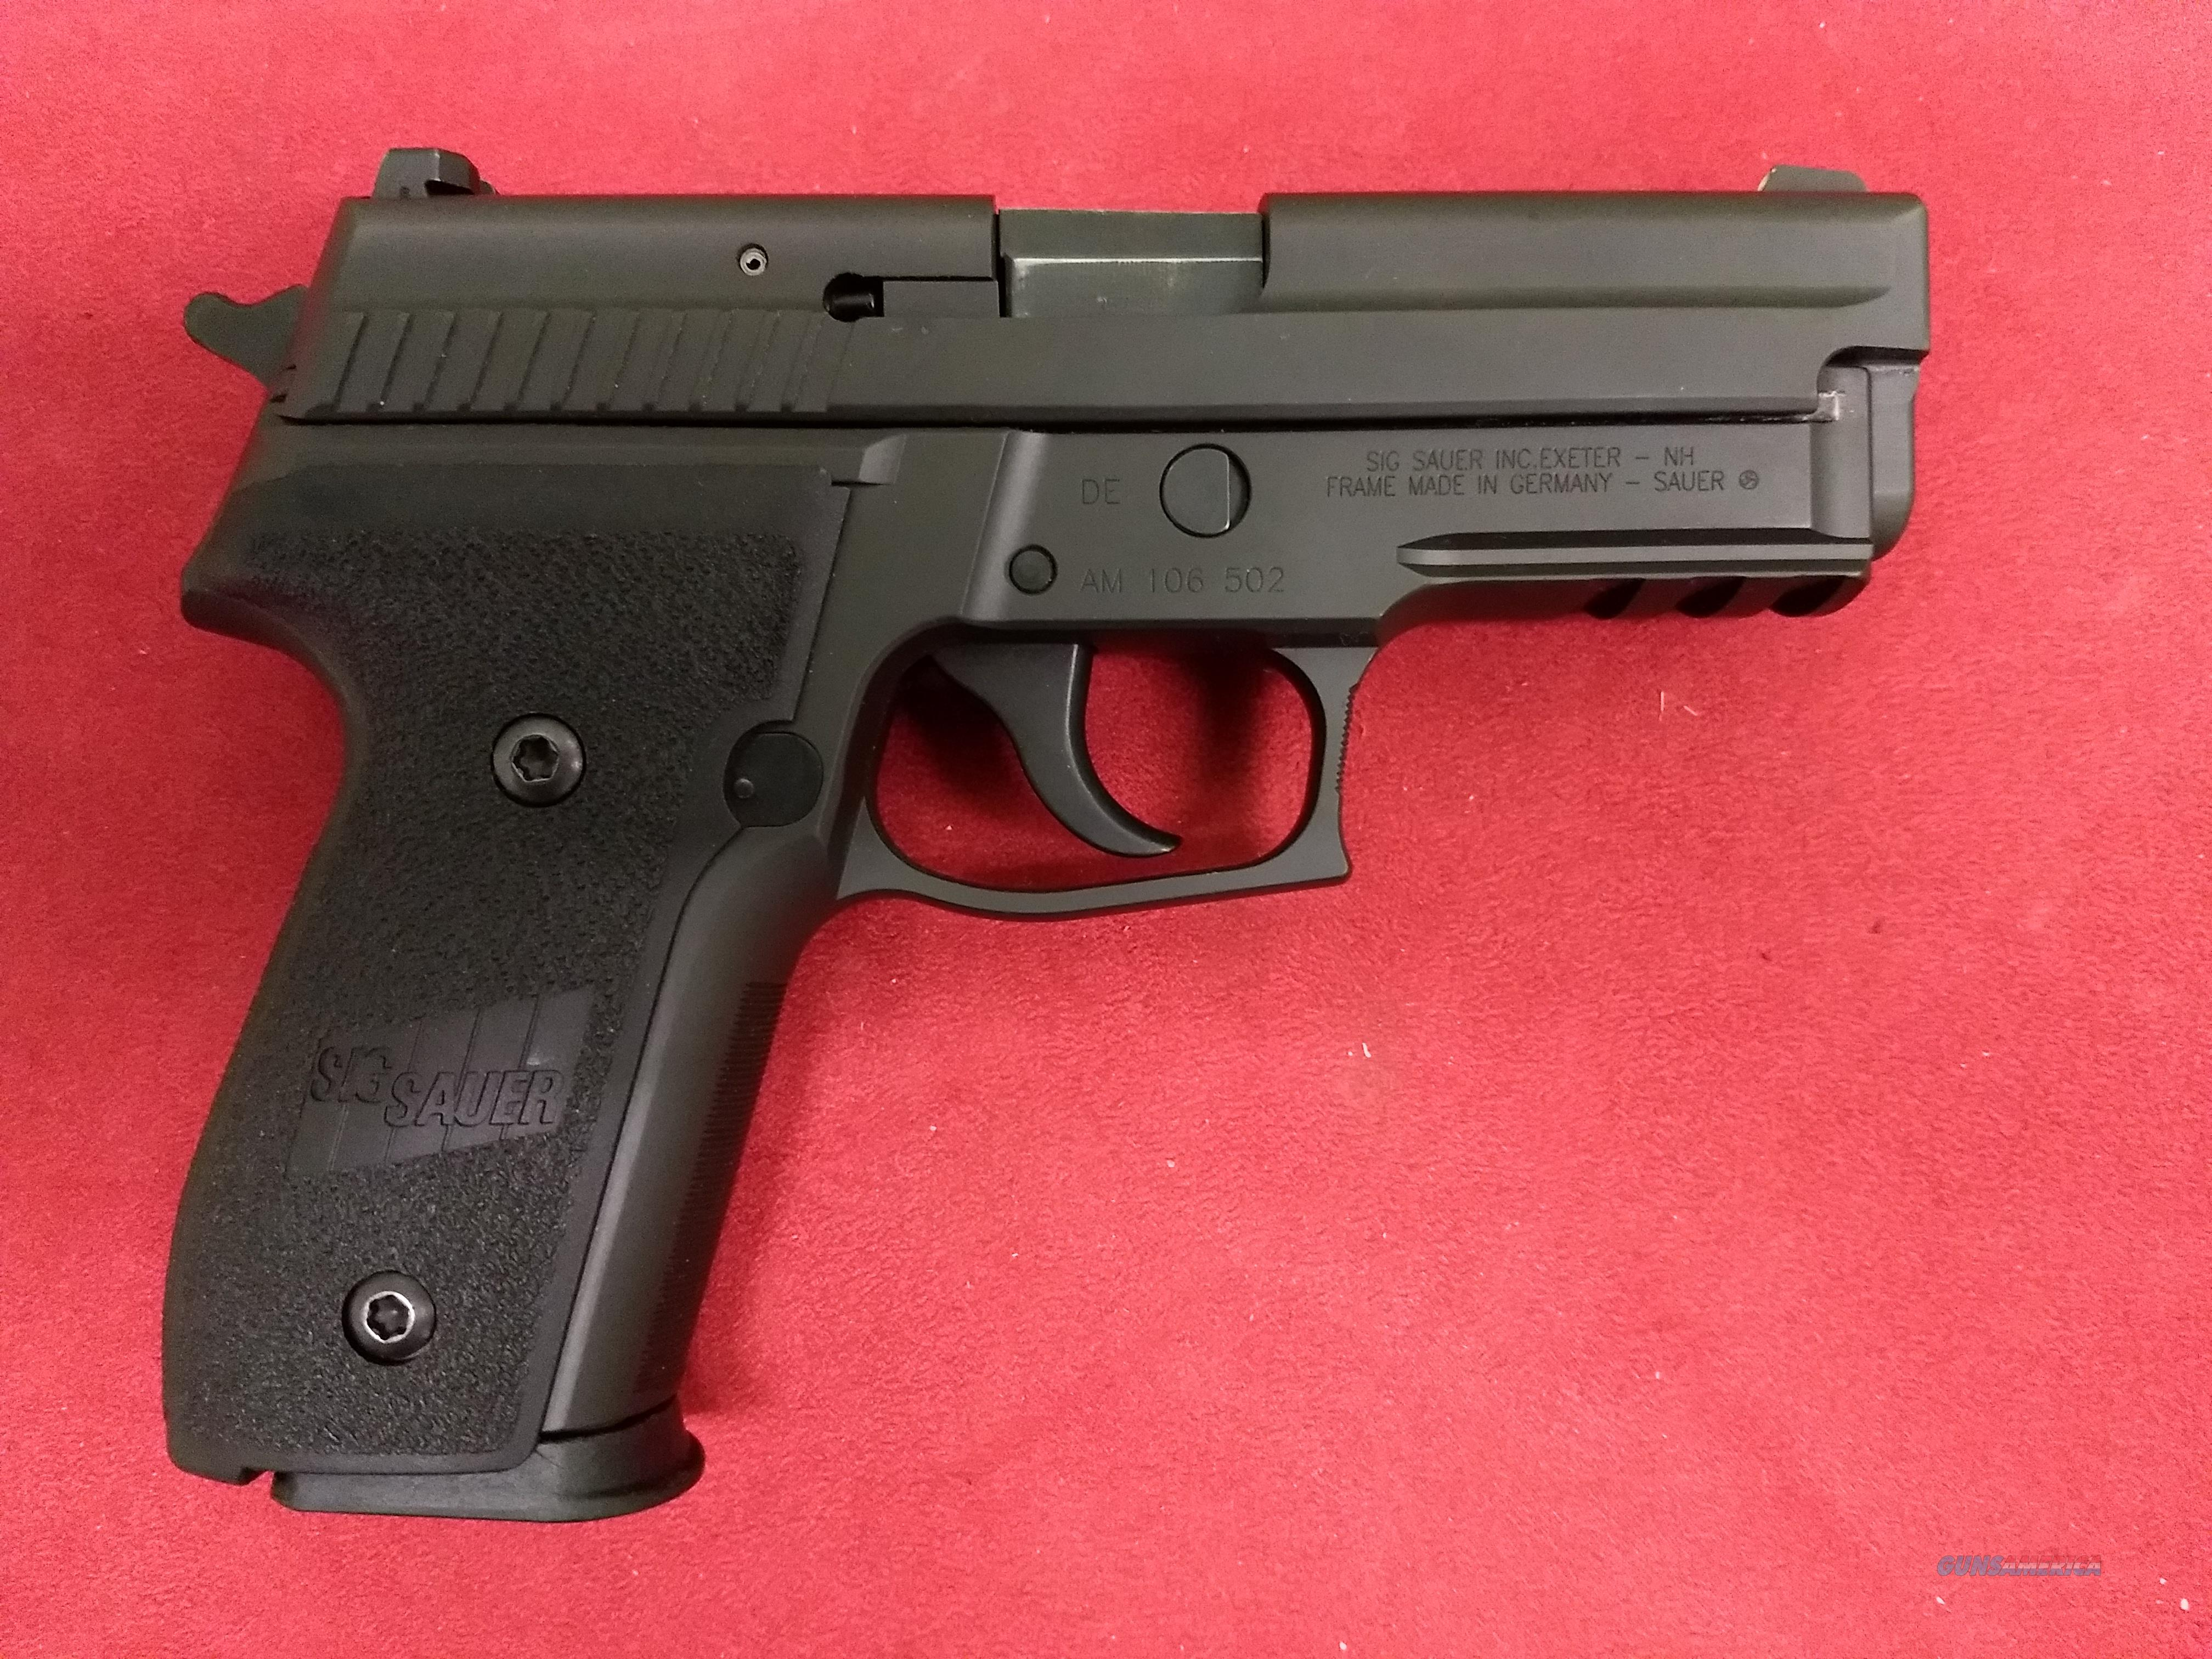 Sig Sauer P229R, .357 Sig + .40 S&W, Lightly Used  Guns > Pistols > Sig - Sauer/Sigarms Pistols > P229